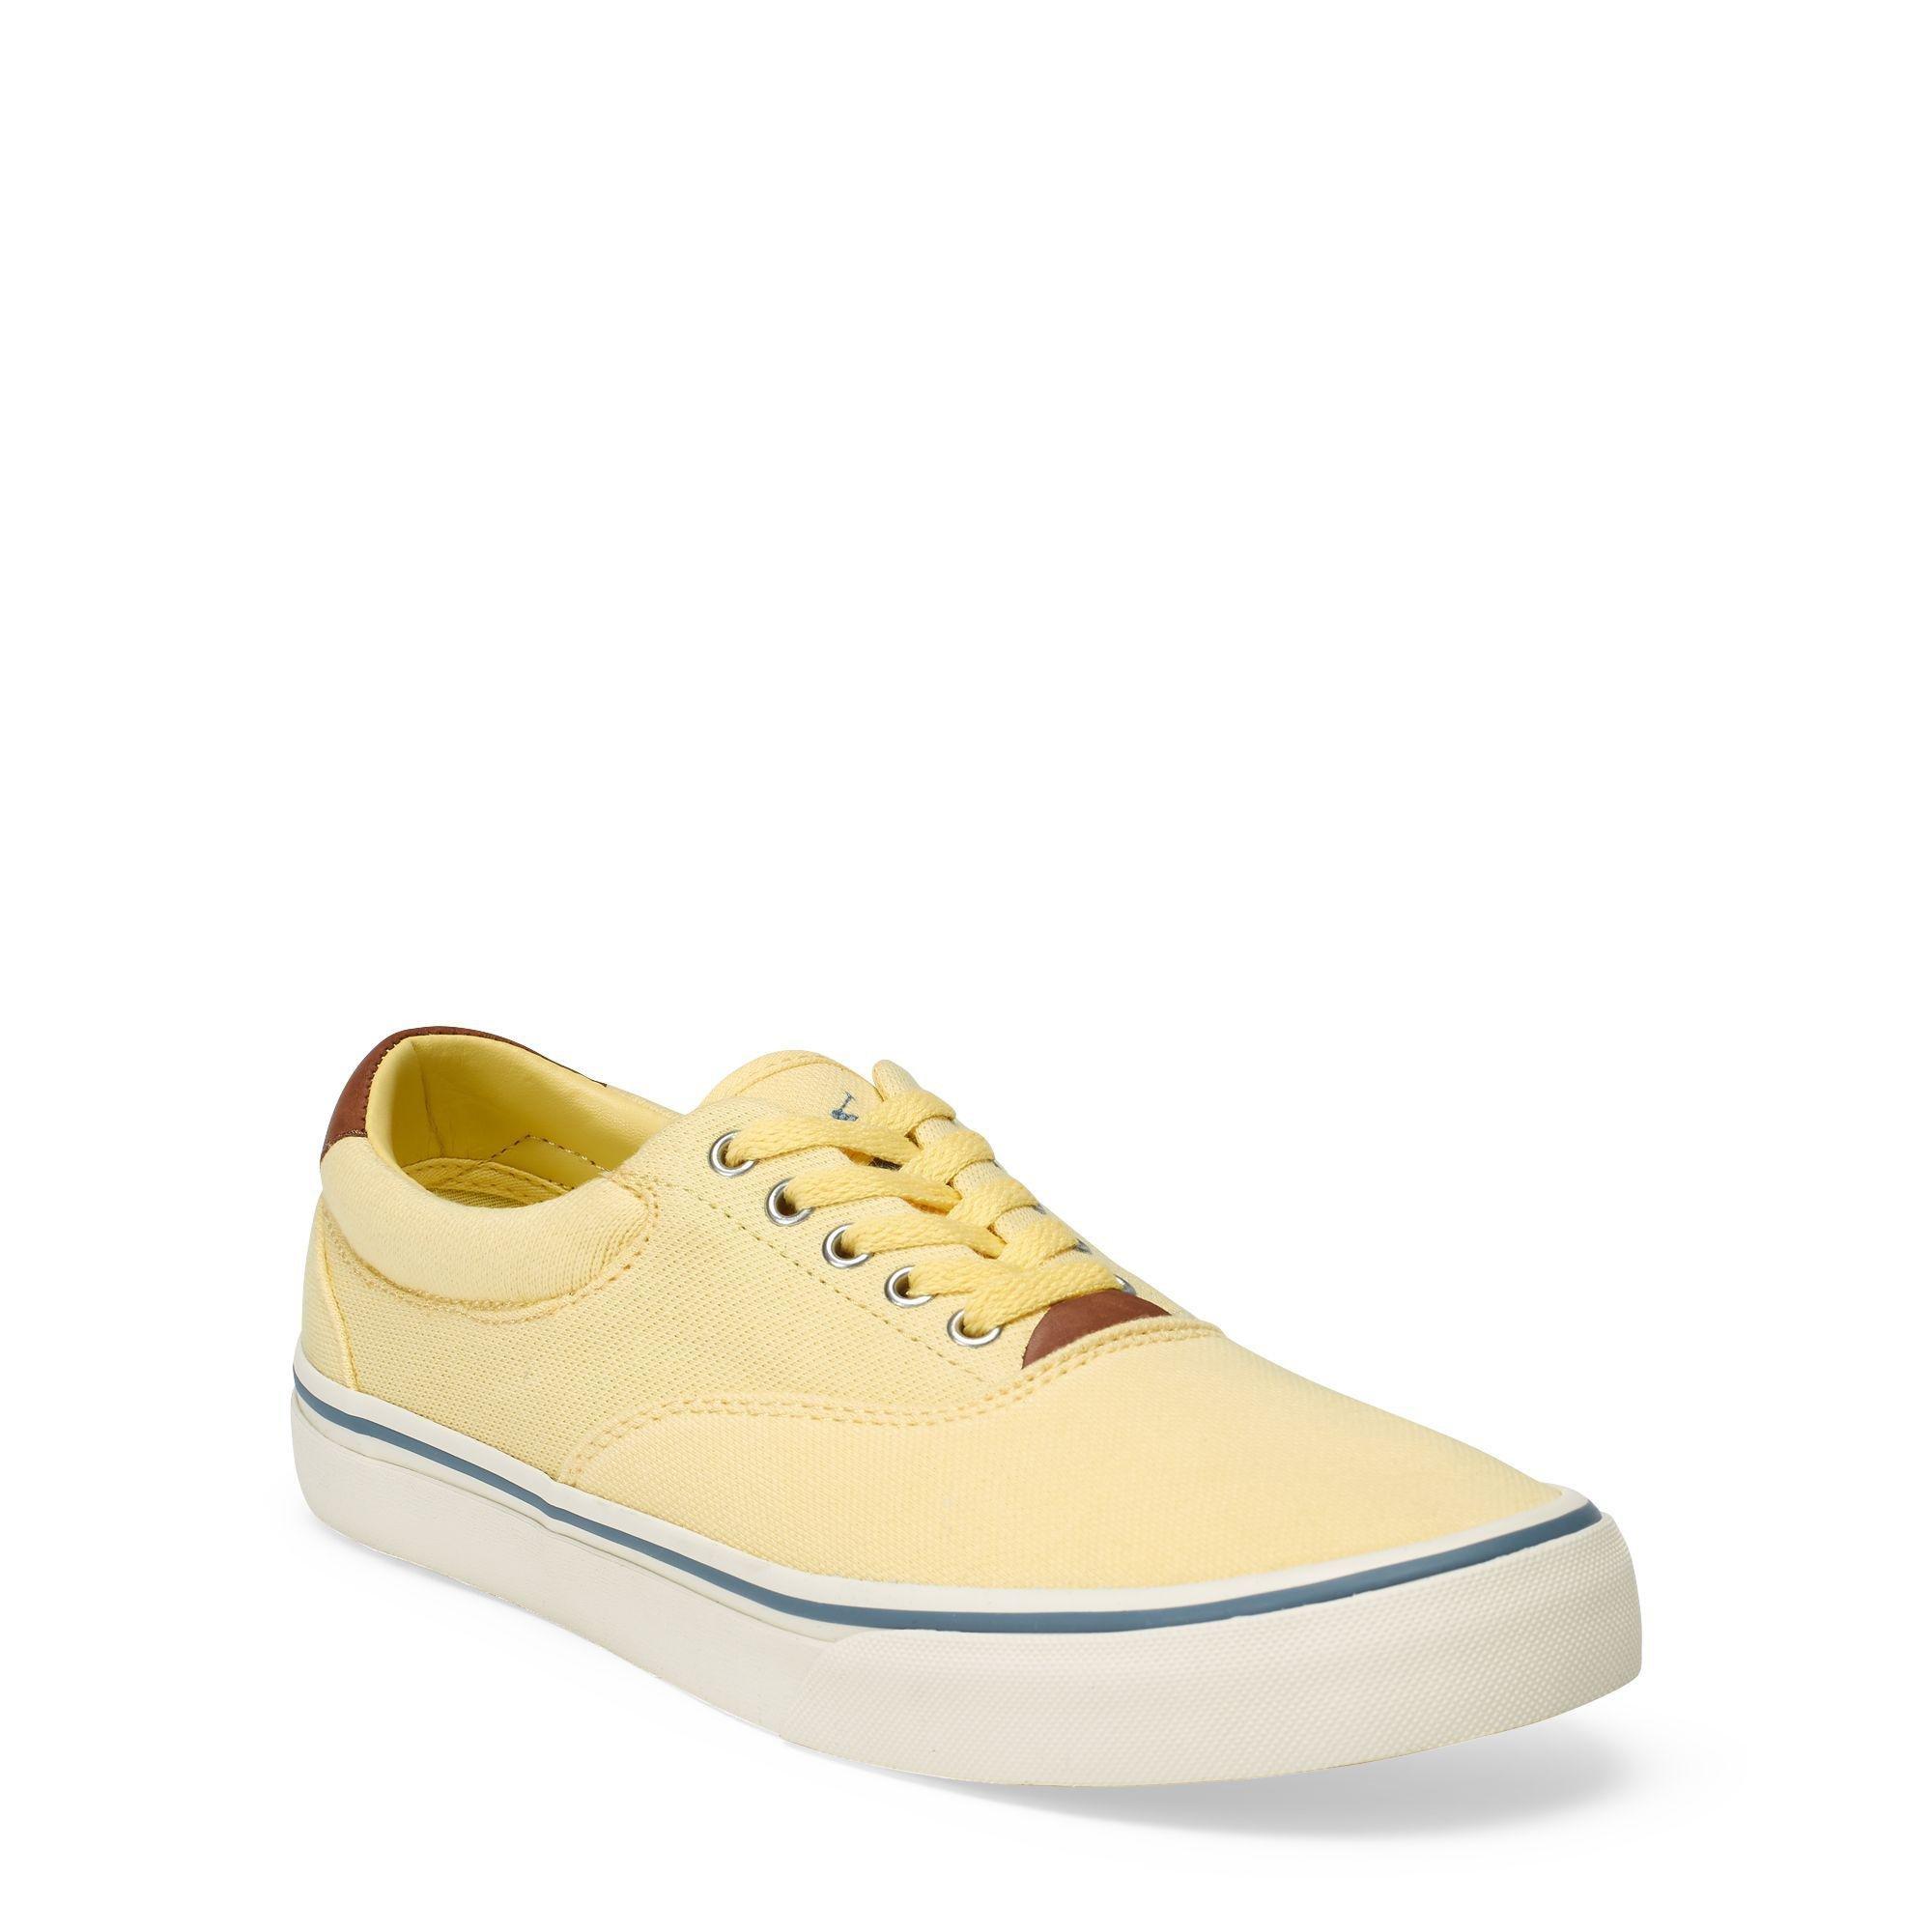 REVENGE PLUS - Sneaker low - banana/white QyVEAOAZ6l